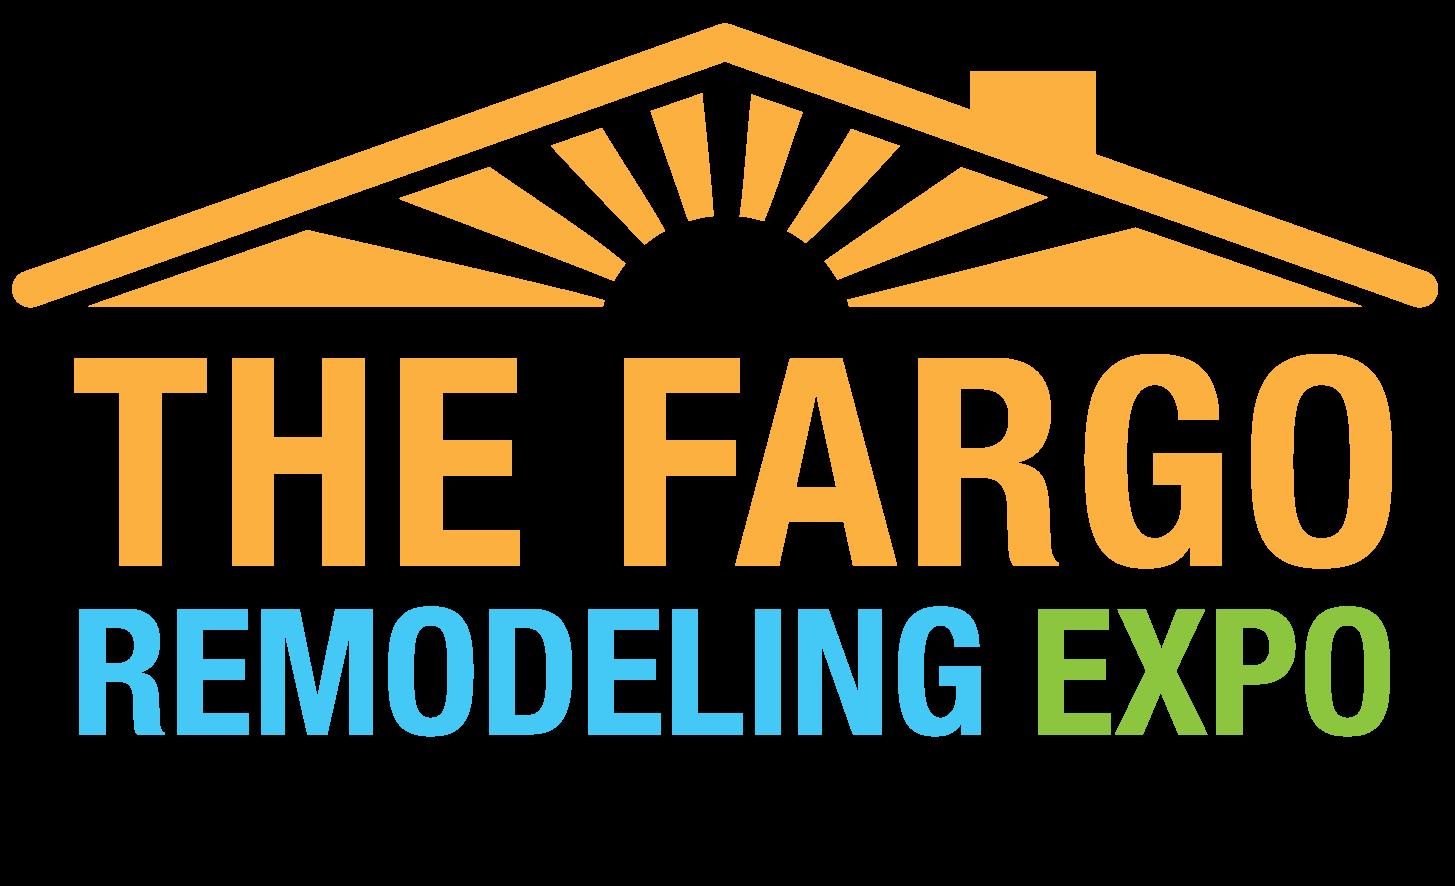 2017 Fargo Remodeling Expo